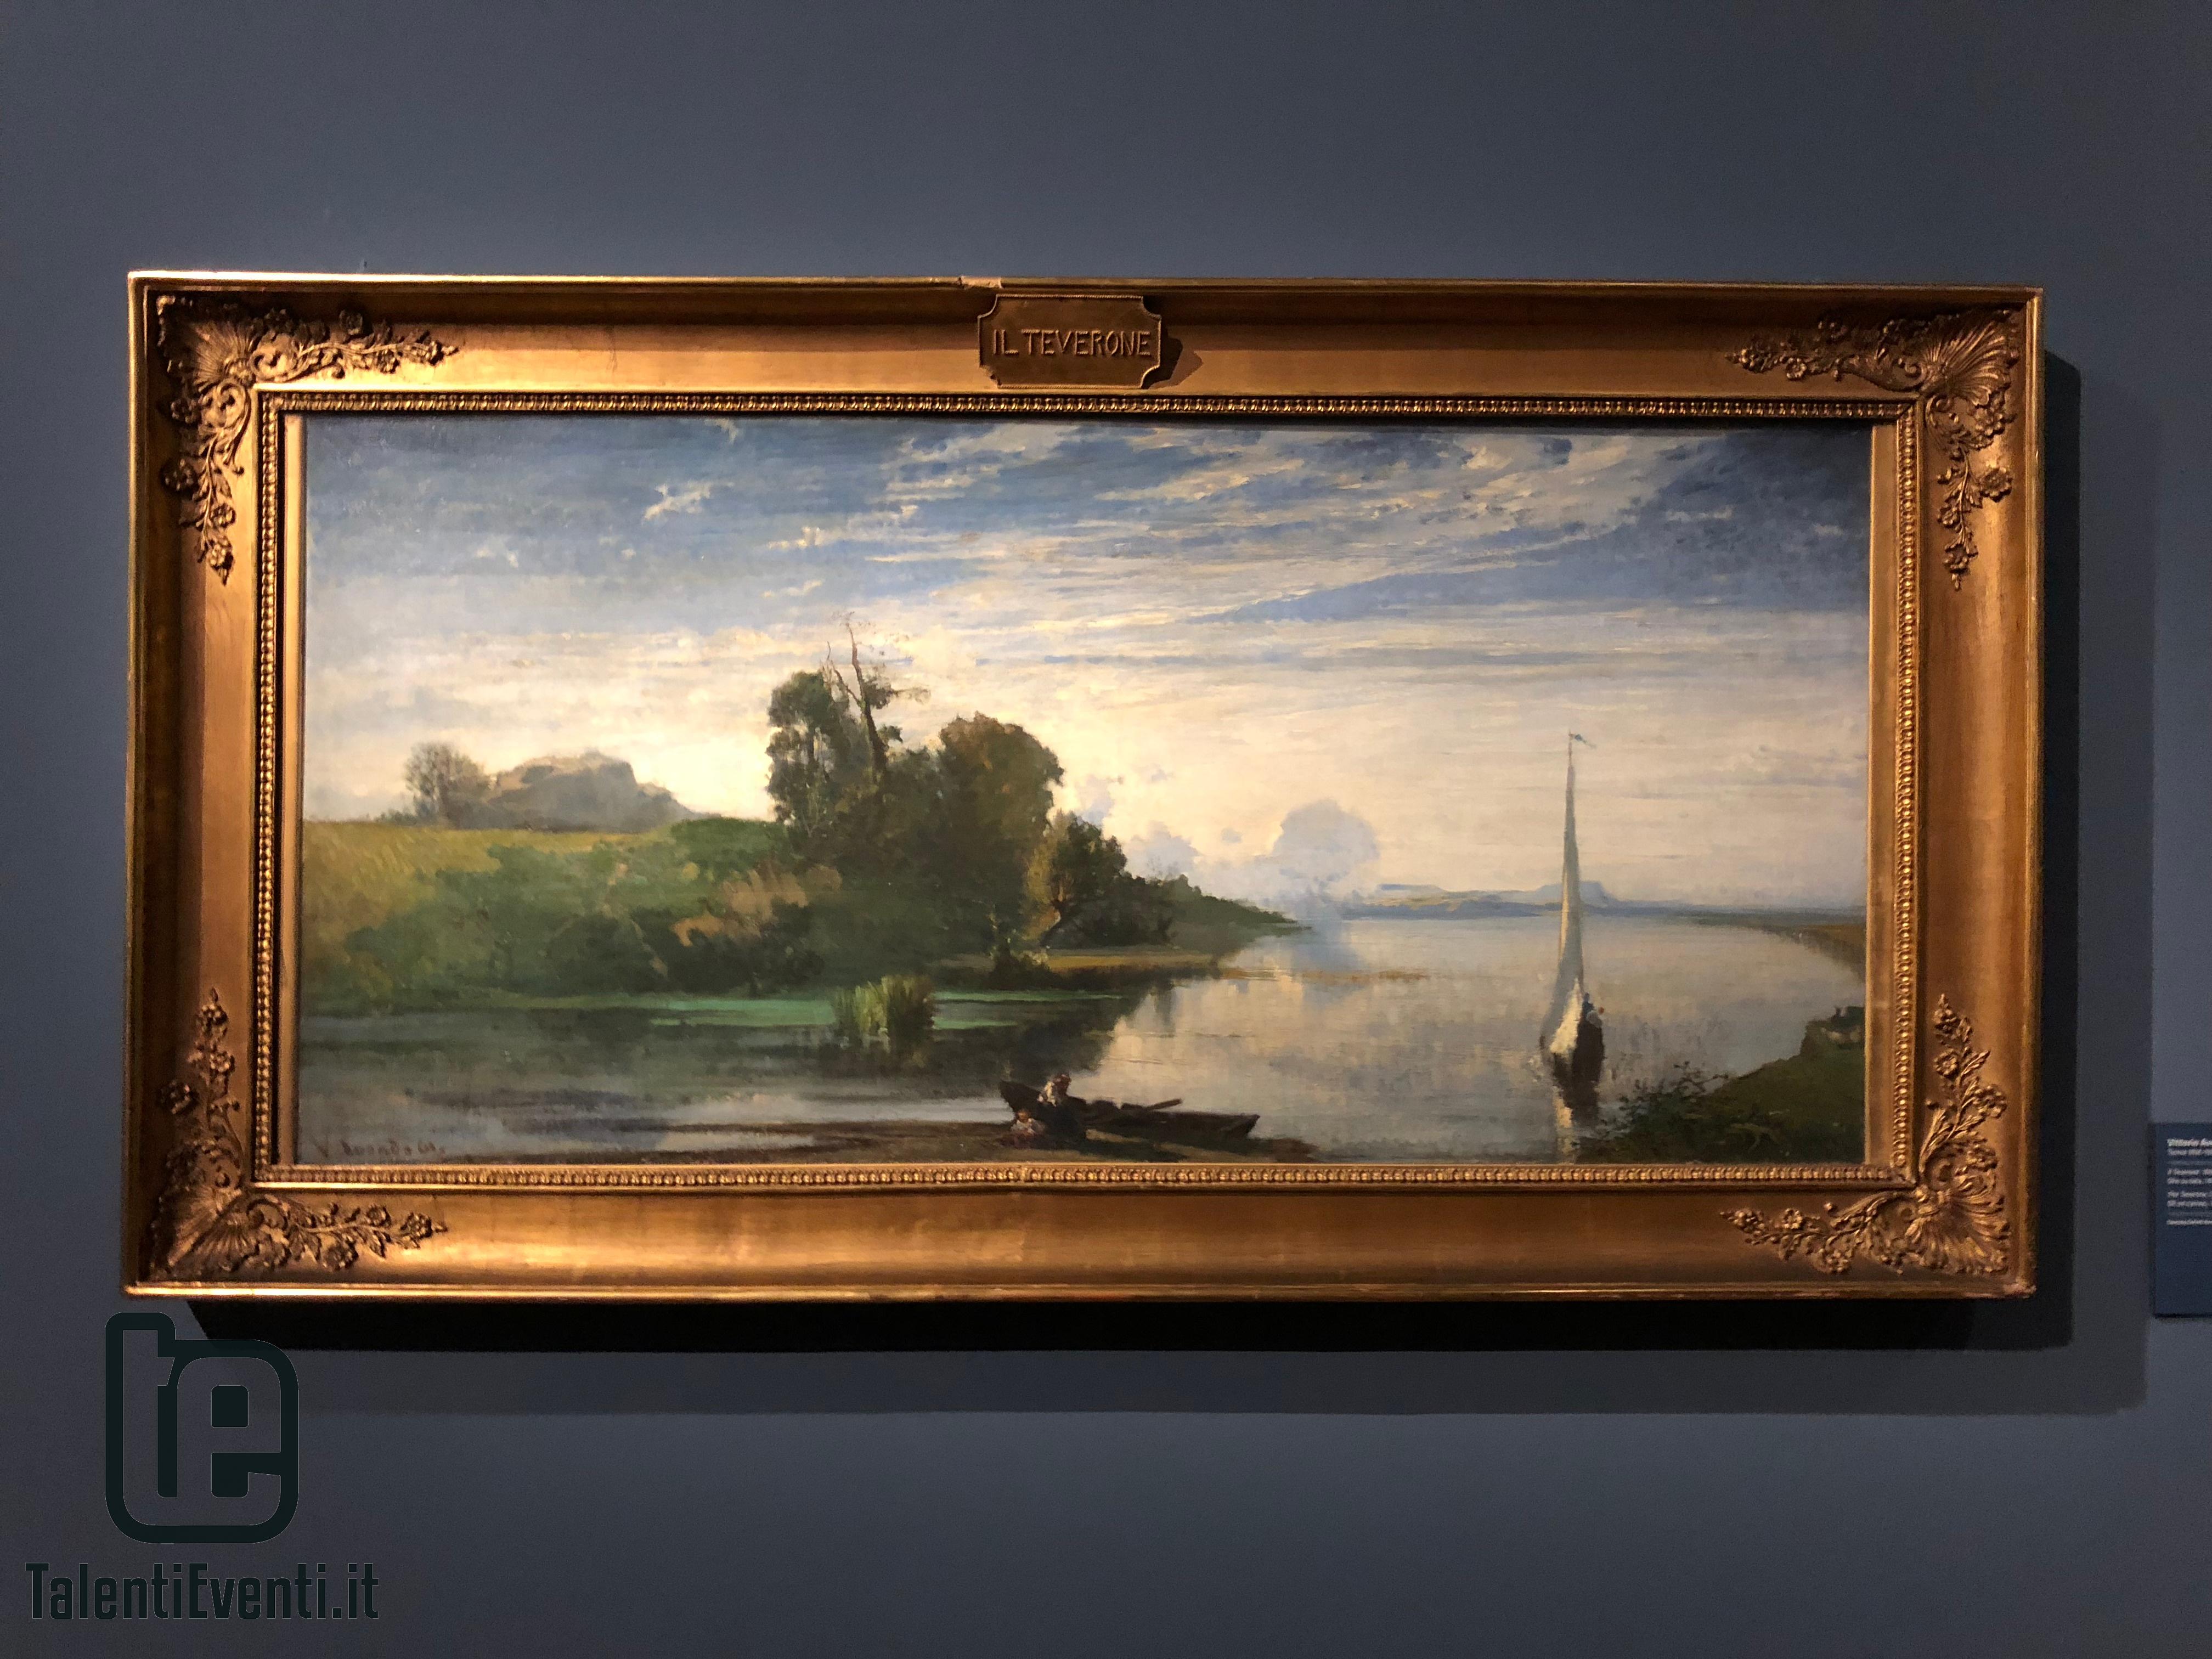 Vittorio Avondo - il Teverone - 1861